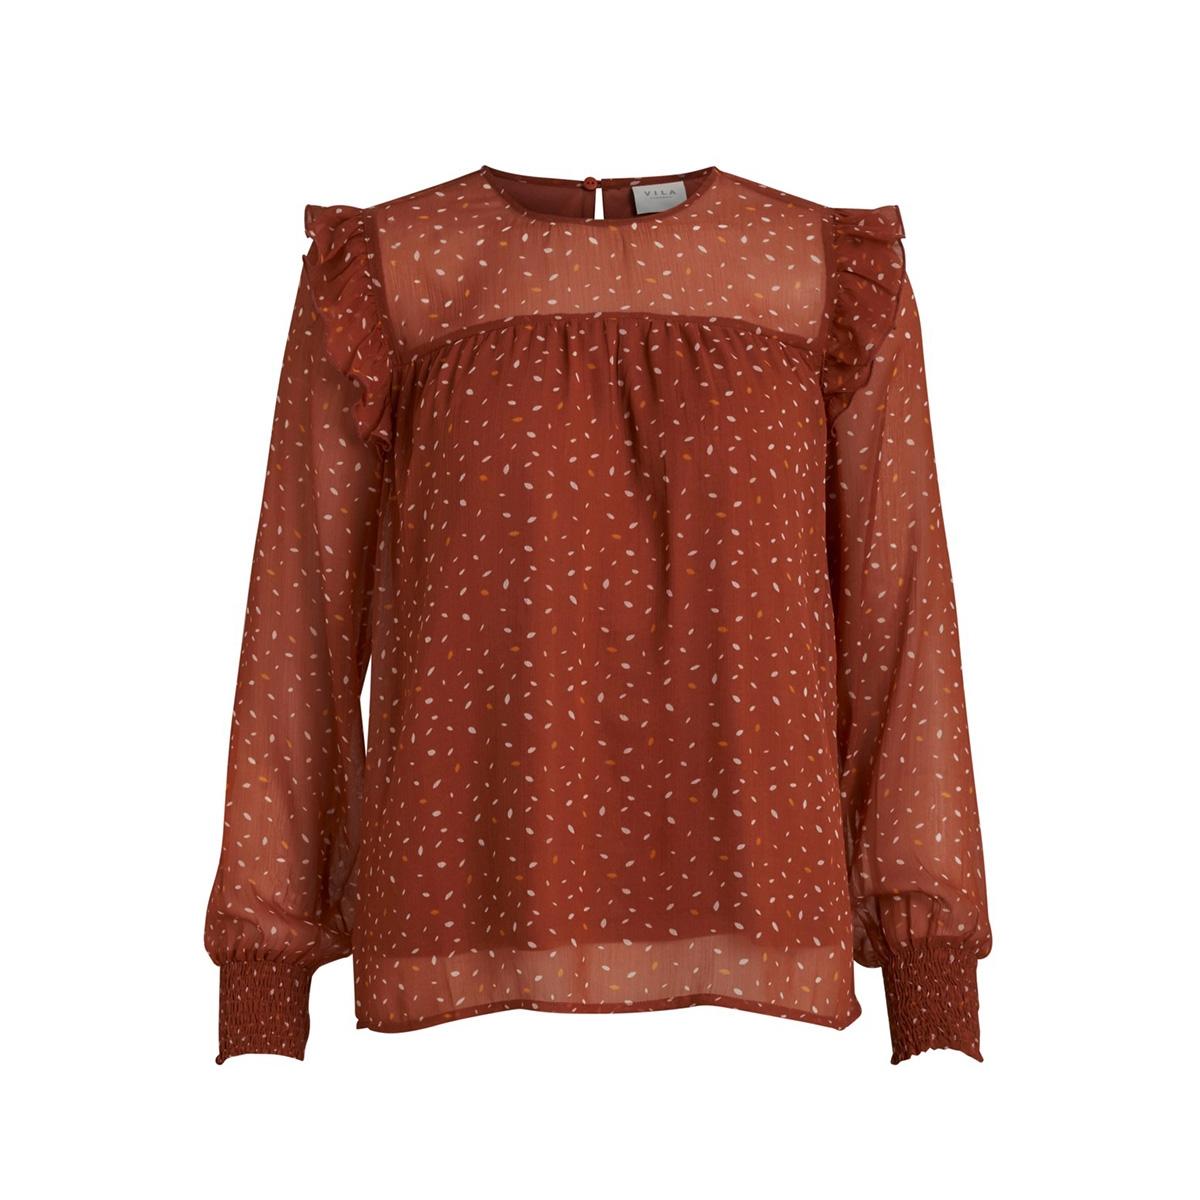 viuta l/s top 14058733 vila blouse copper brown/dots